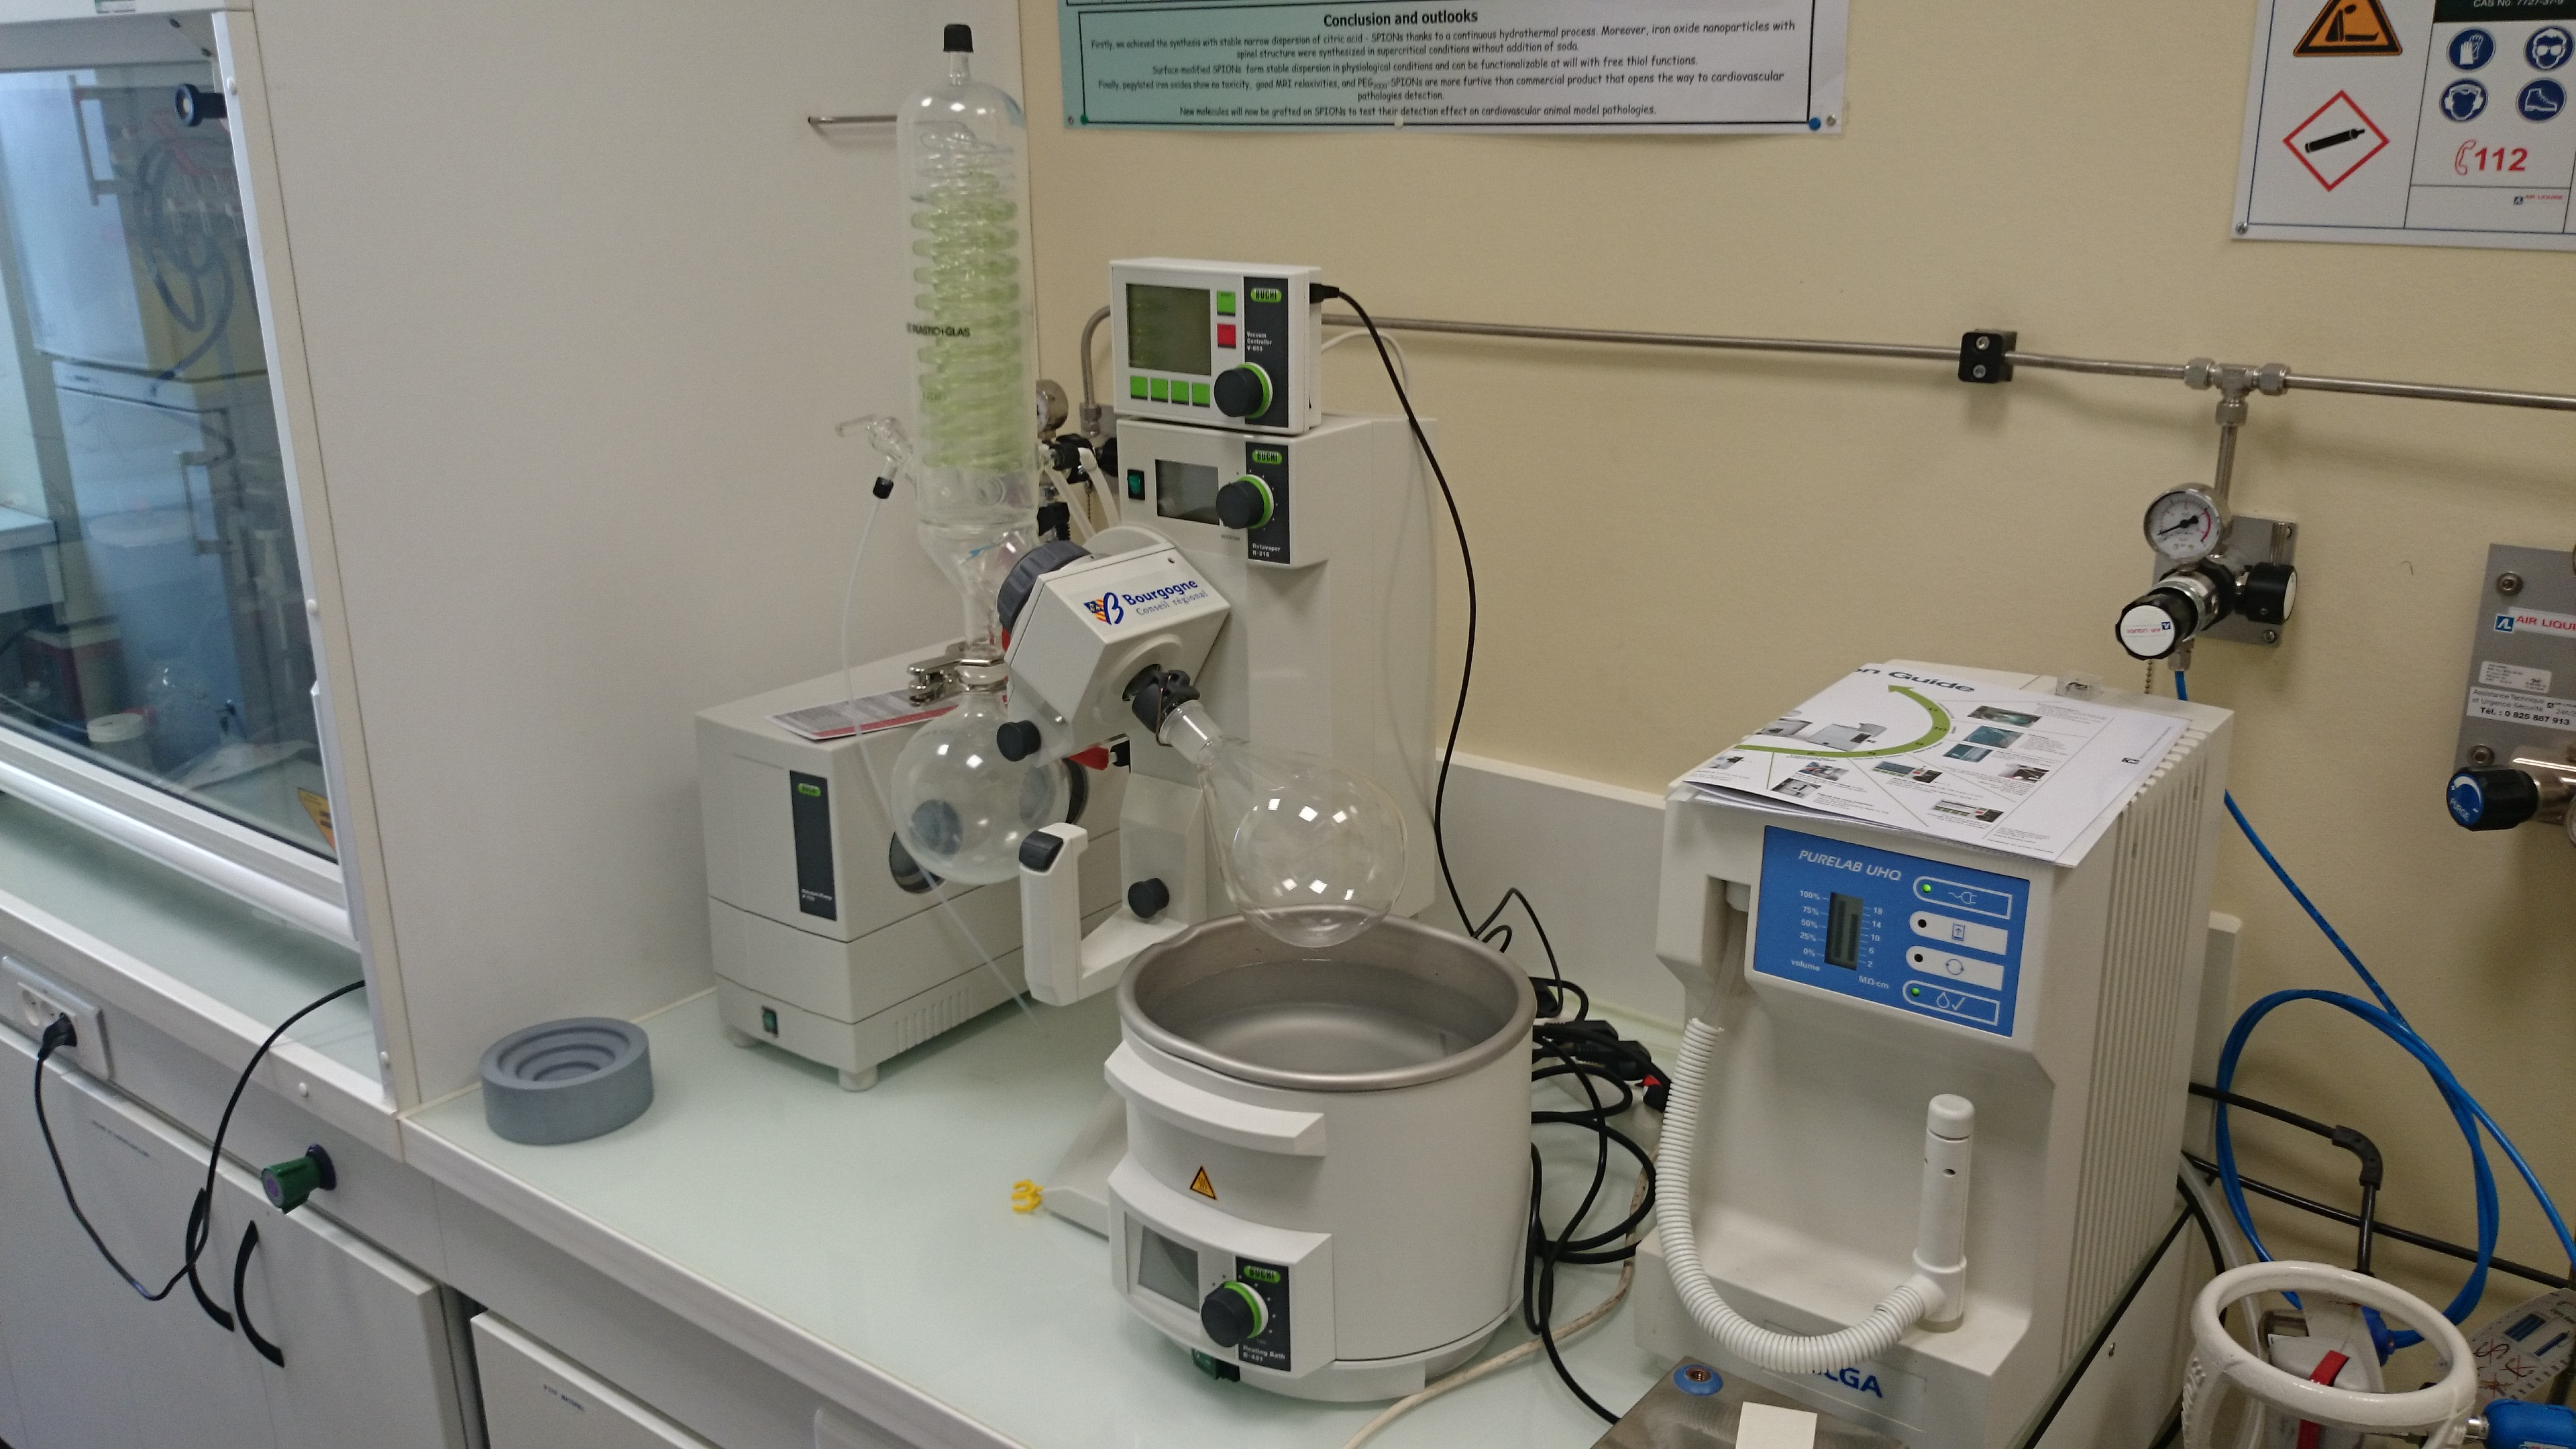 Rotary evaporator: Büchi Rotavapor R-215, vacuum system V-855 + autodistillation probe, réfrigérant V-700 refrigerant and F-105 cooling system